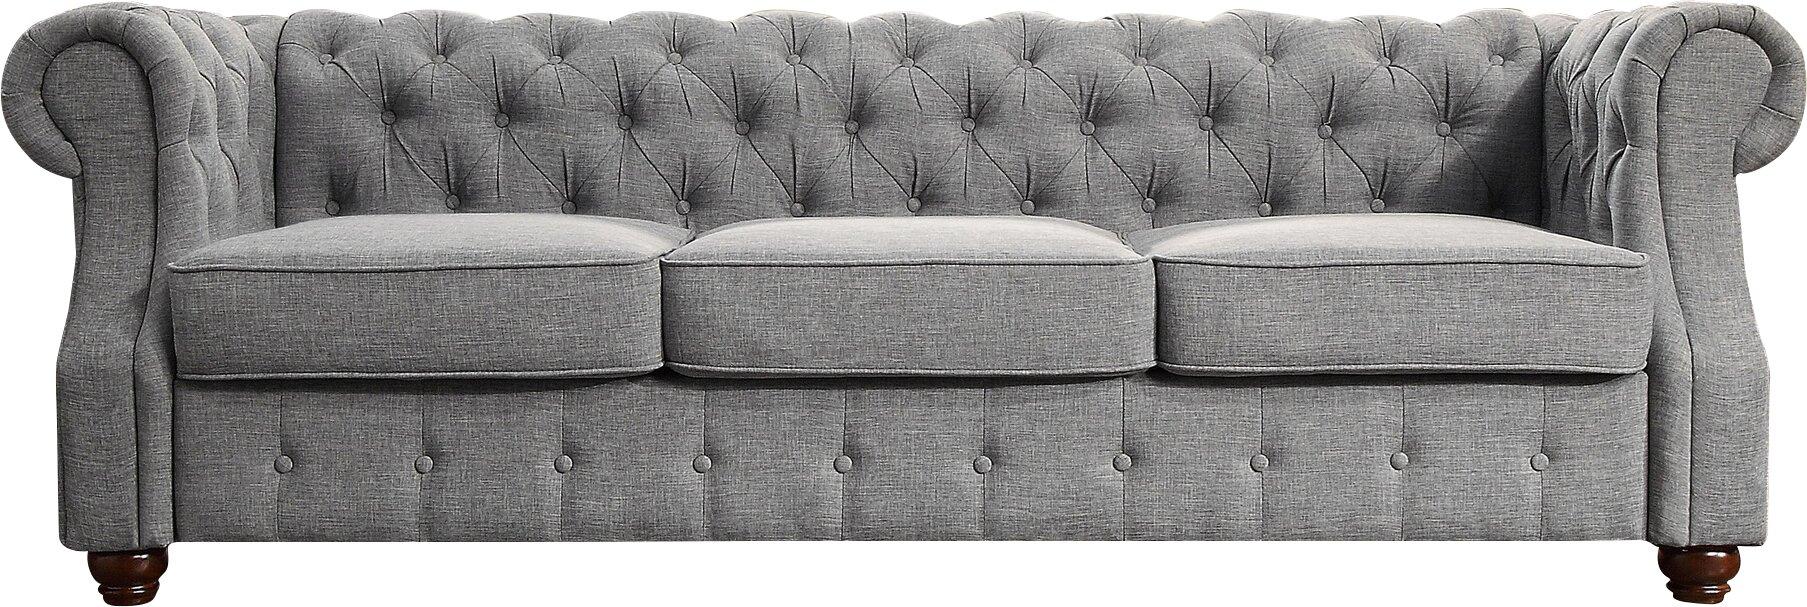 Olivia Tufted Chesterfield Sofa